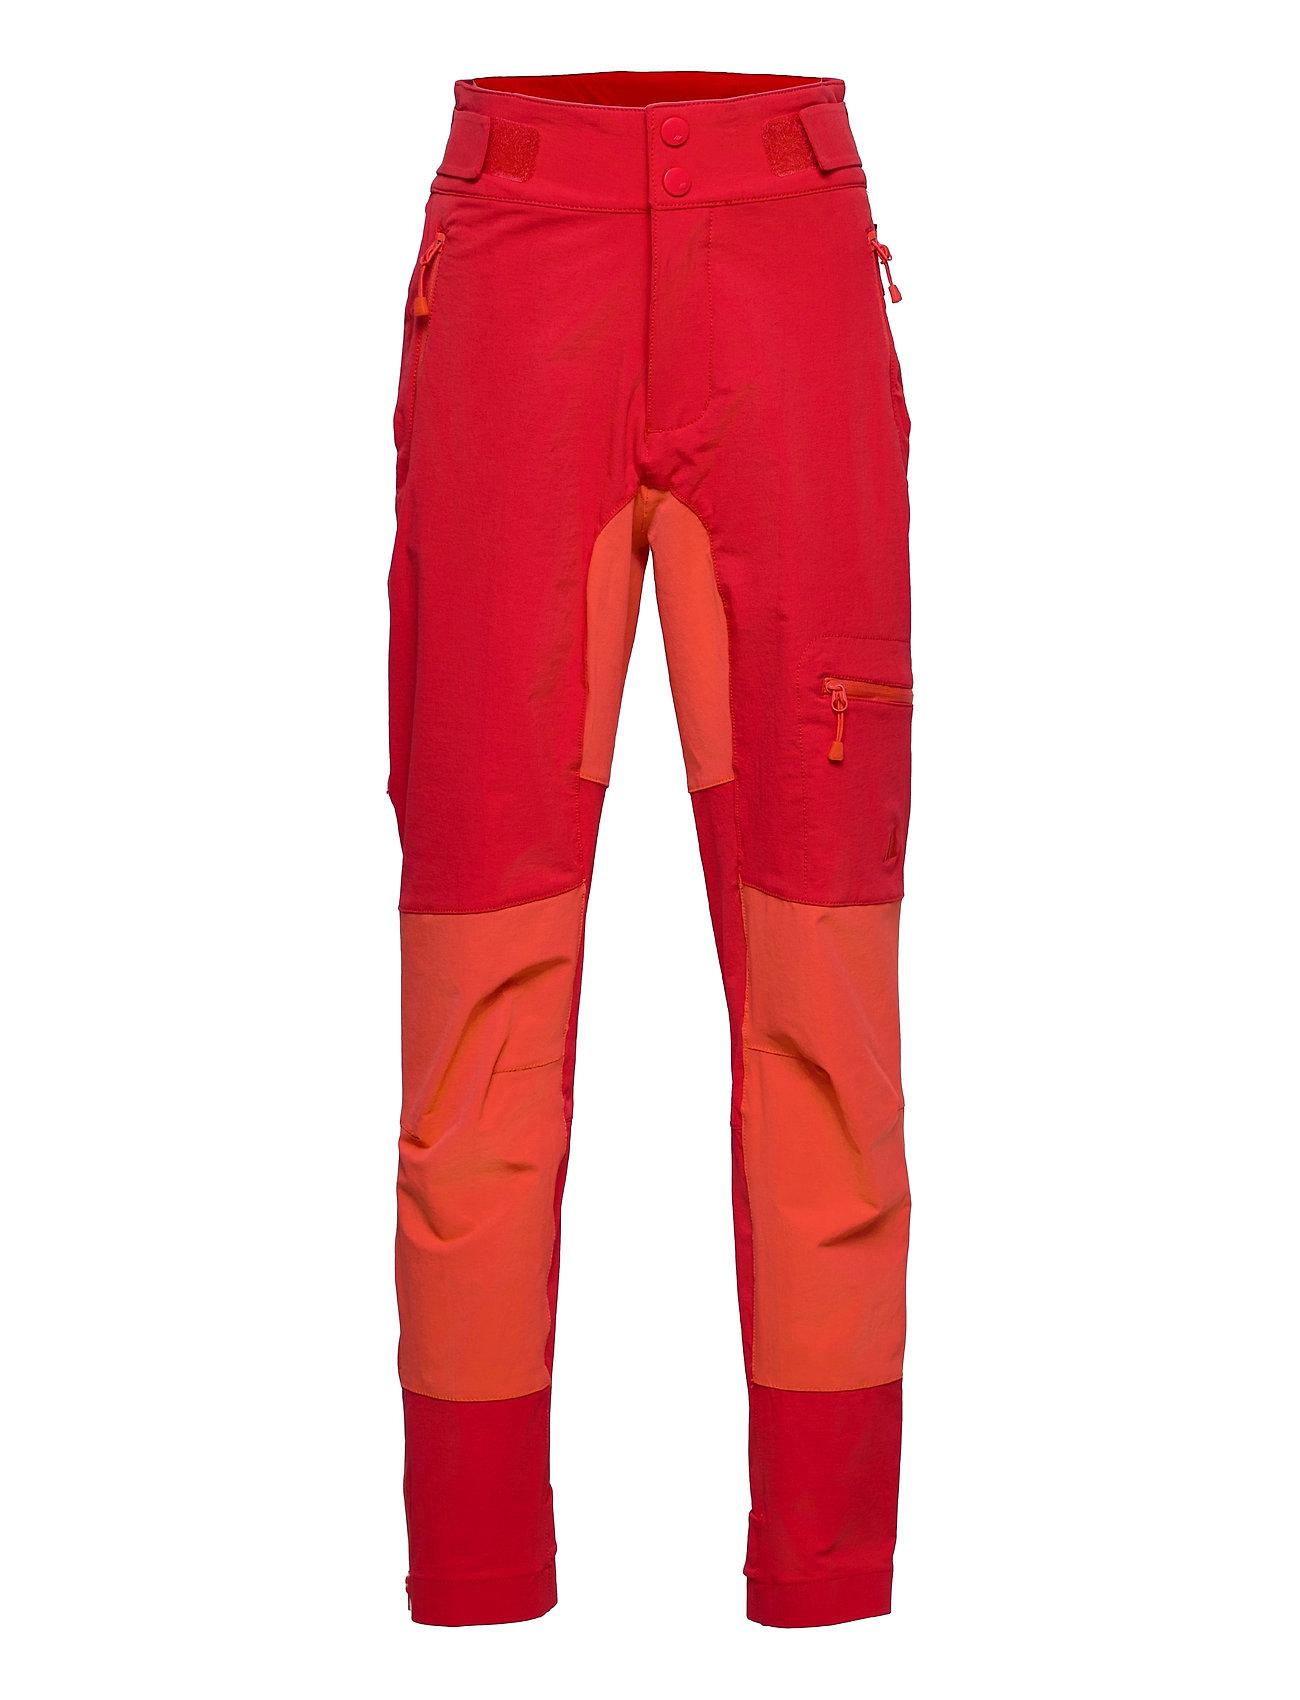 LøNahorgi Hiking Trousers Outerwear Softshells Softshell Trousers Rød Skogstad